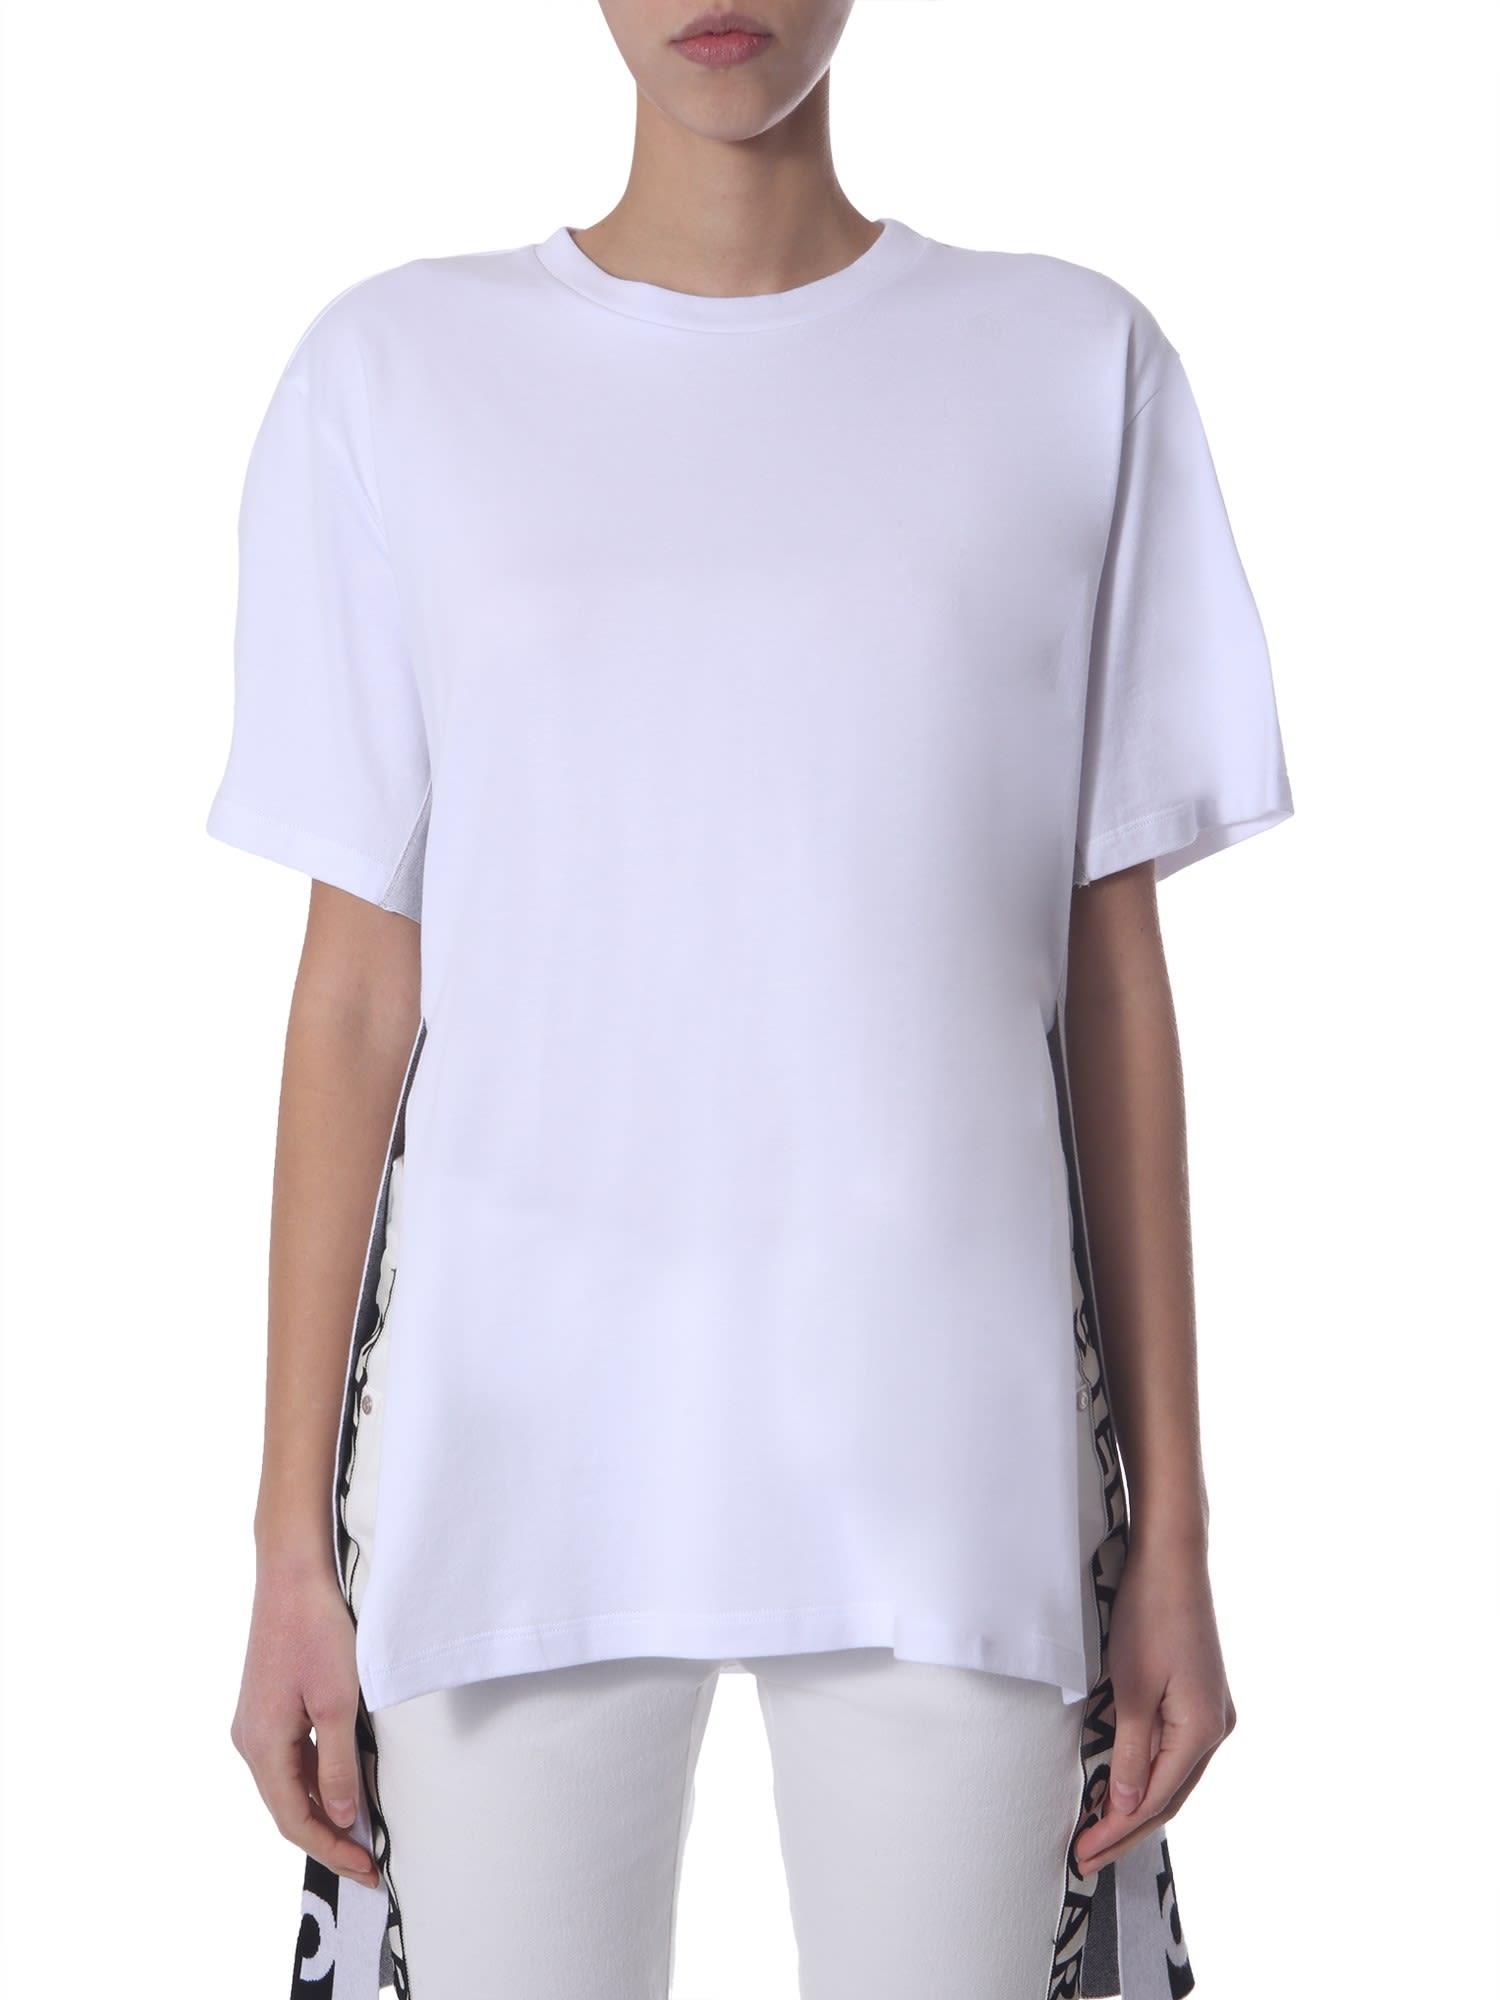 Stella McCartney Round Neck T-shirt